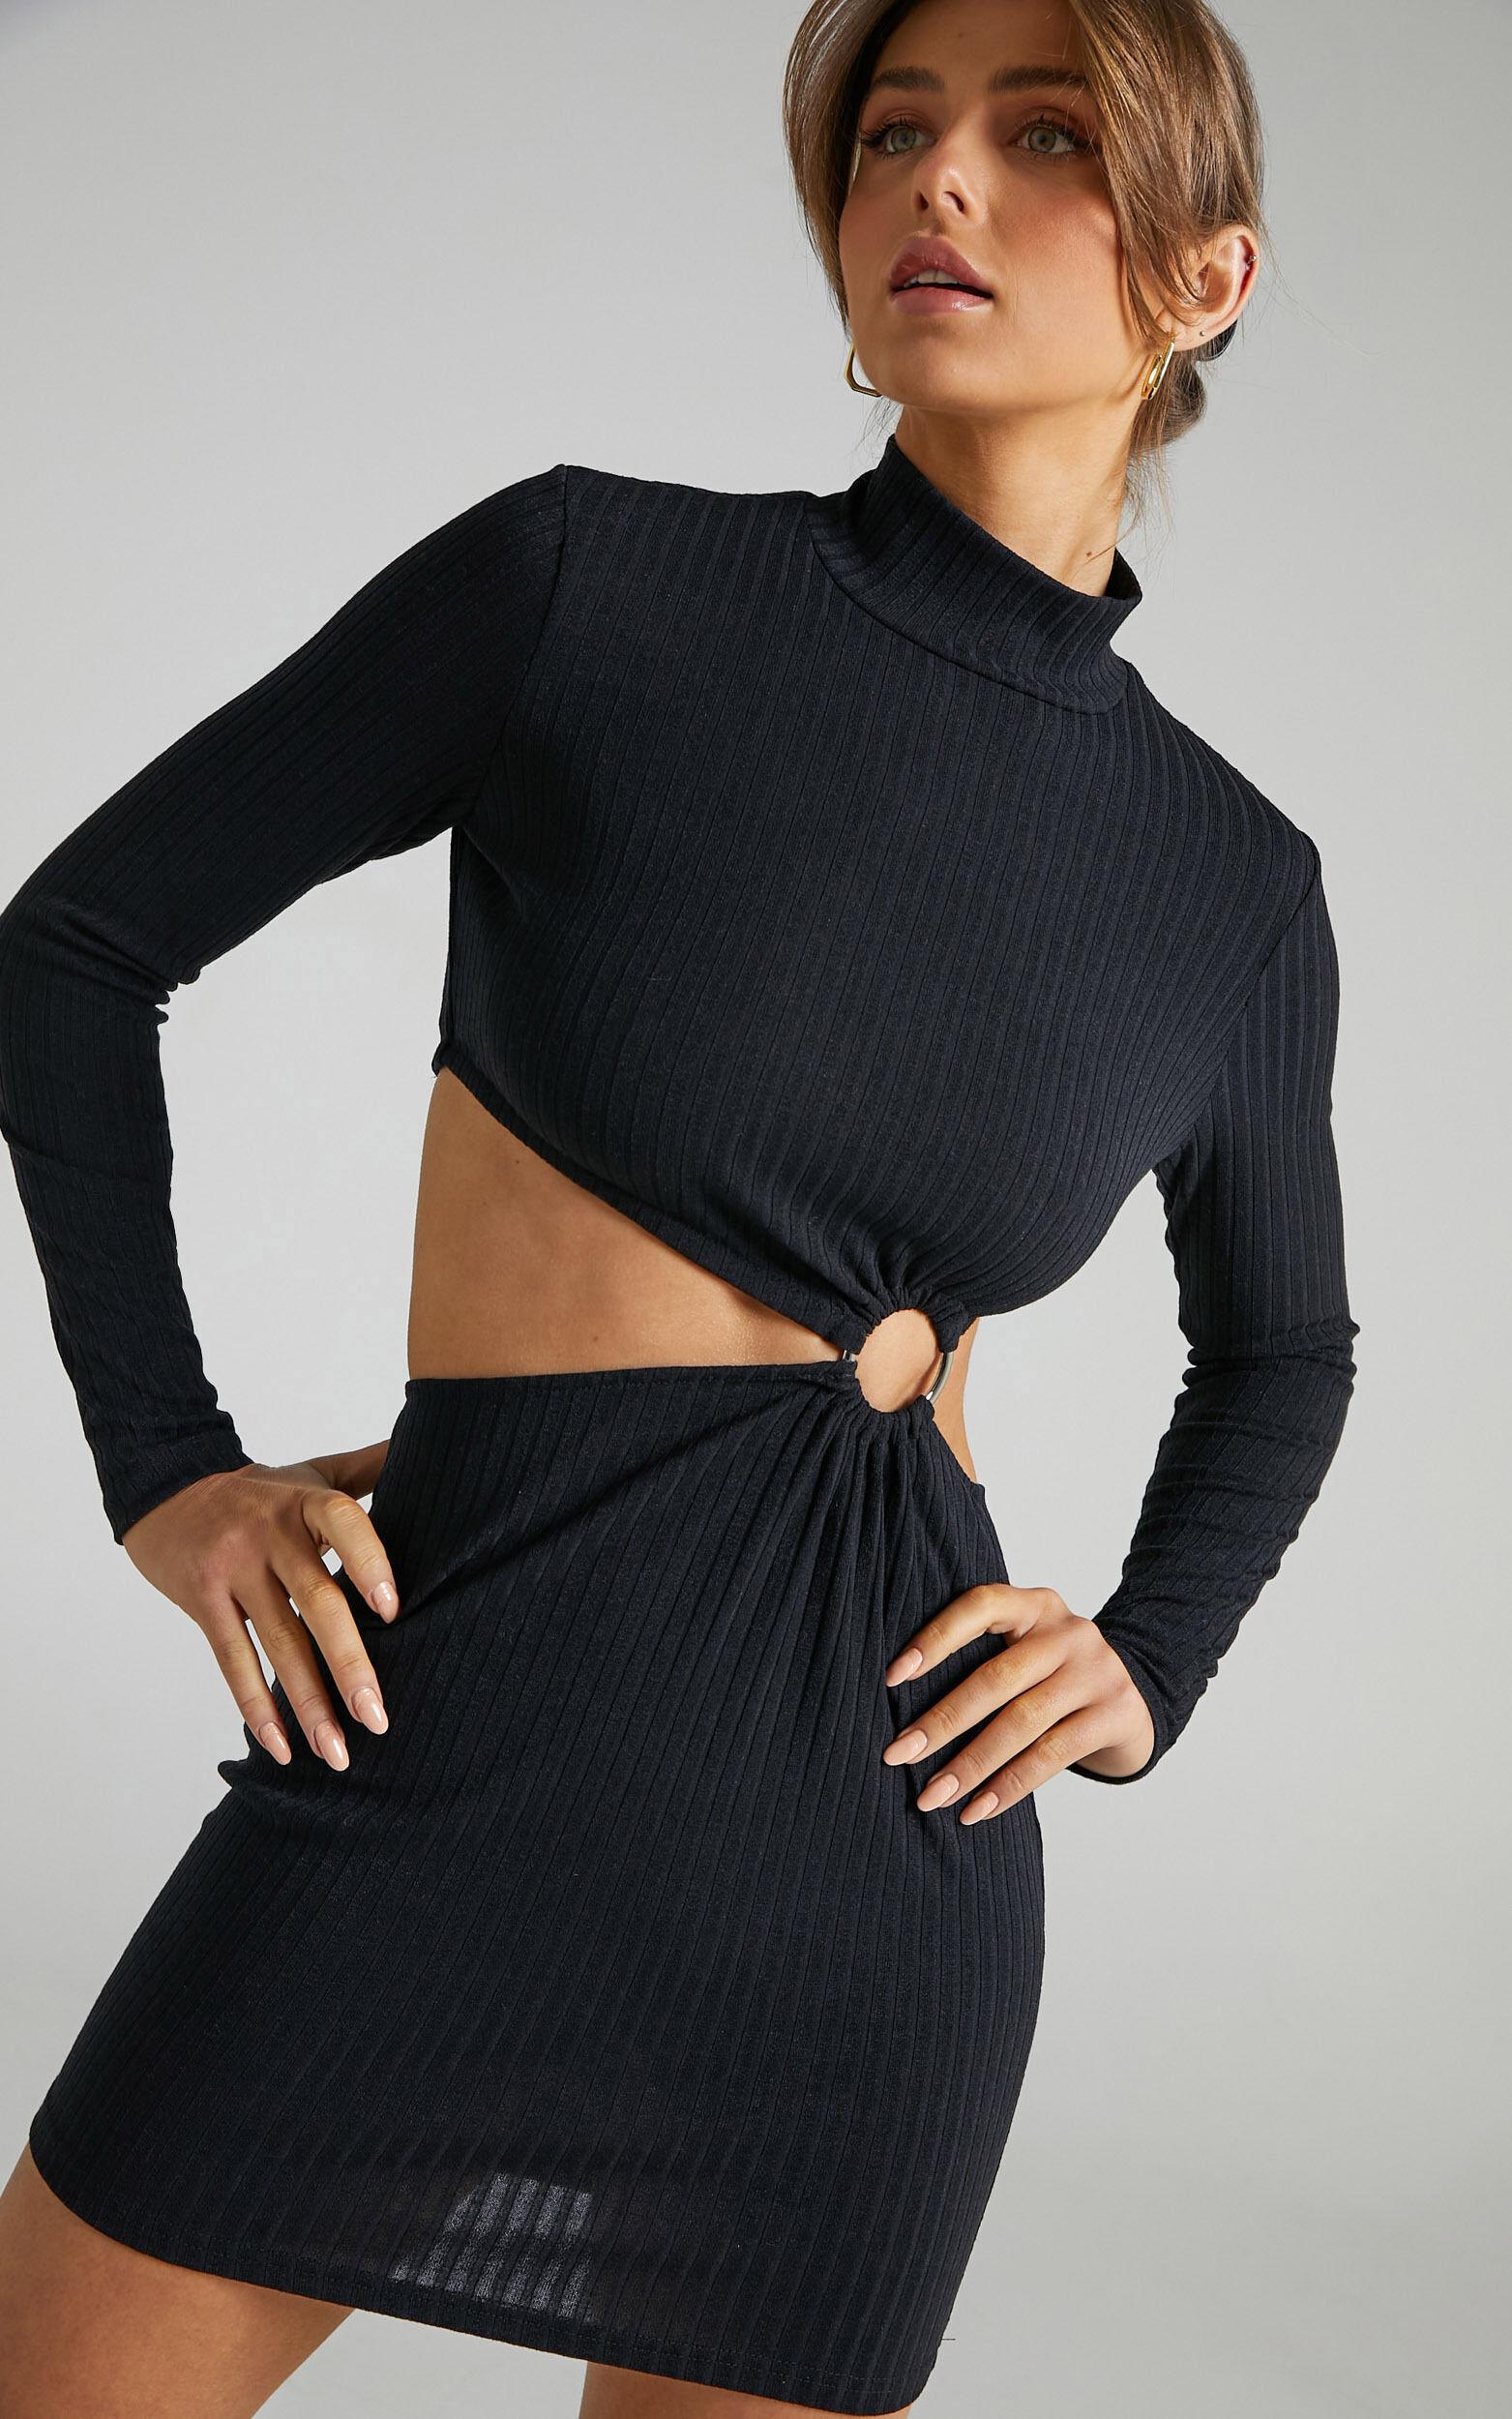 Binda Cut Out Long Sleeve Mini Dress in Black - 06, BLK1, super-hi-res image number null